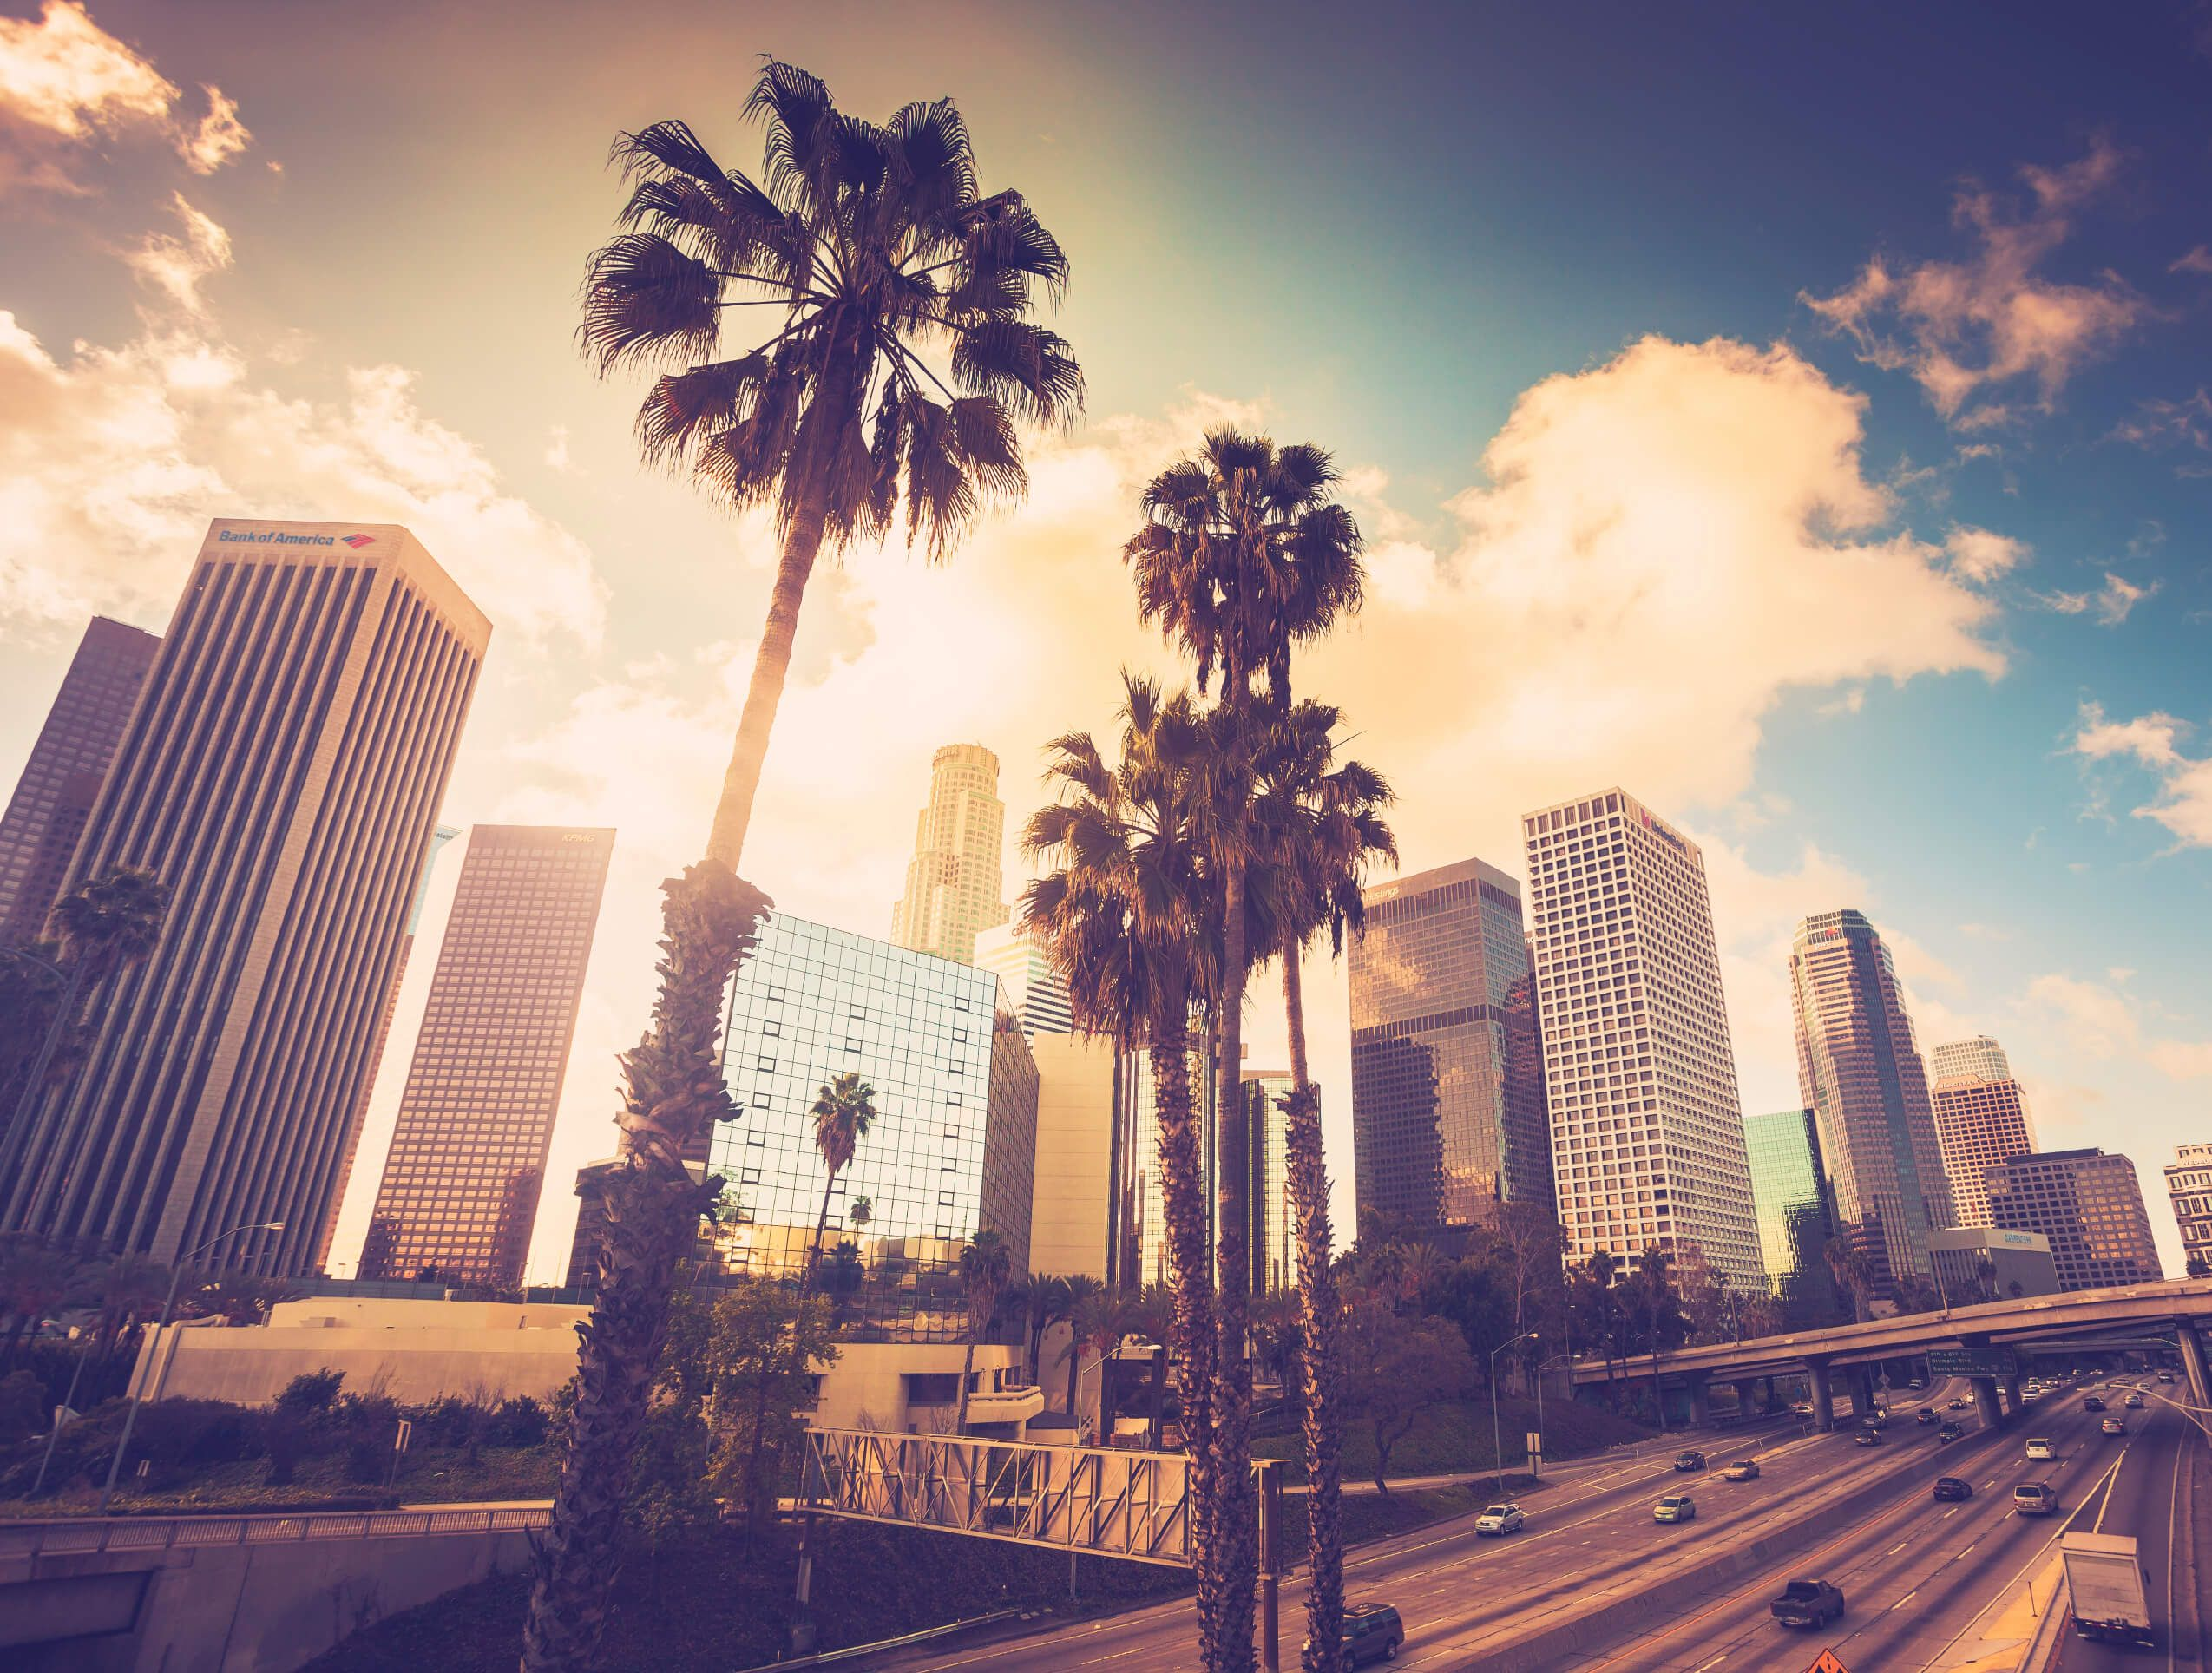 We L A California Travel Road Trips La Trip Visit Los Angeles